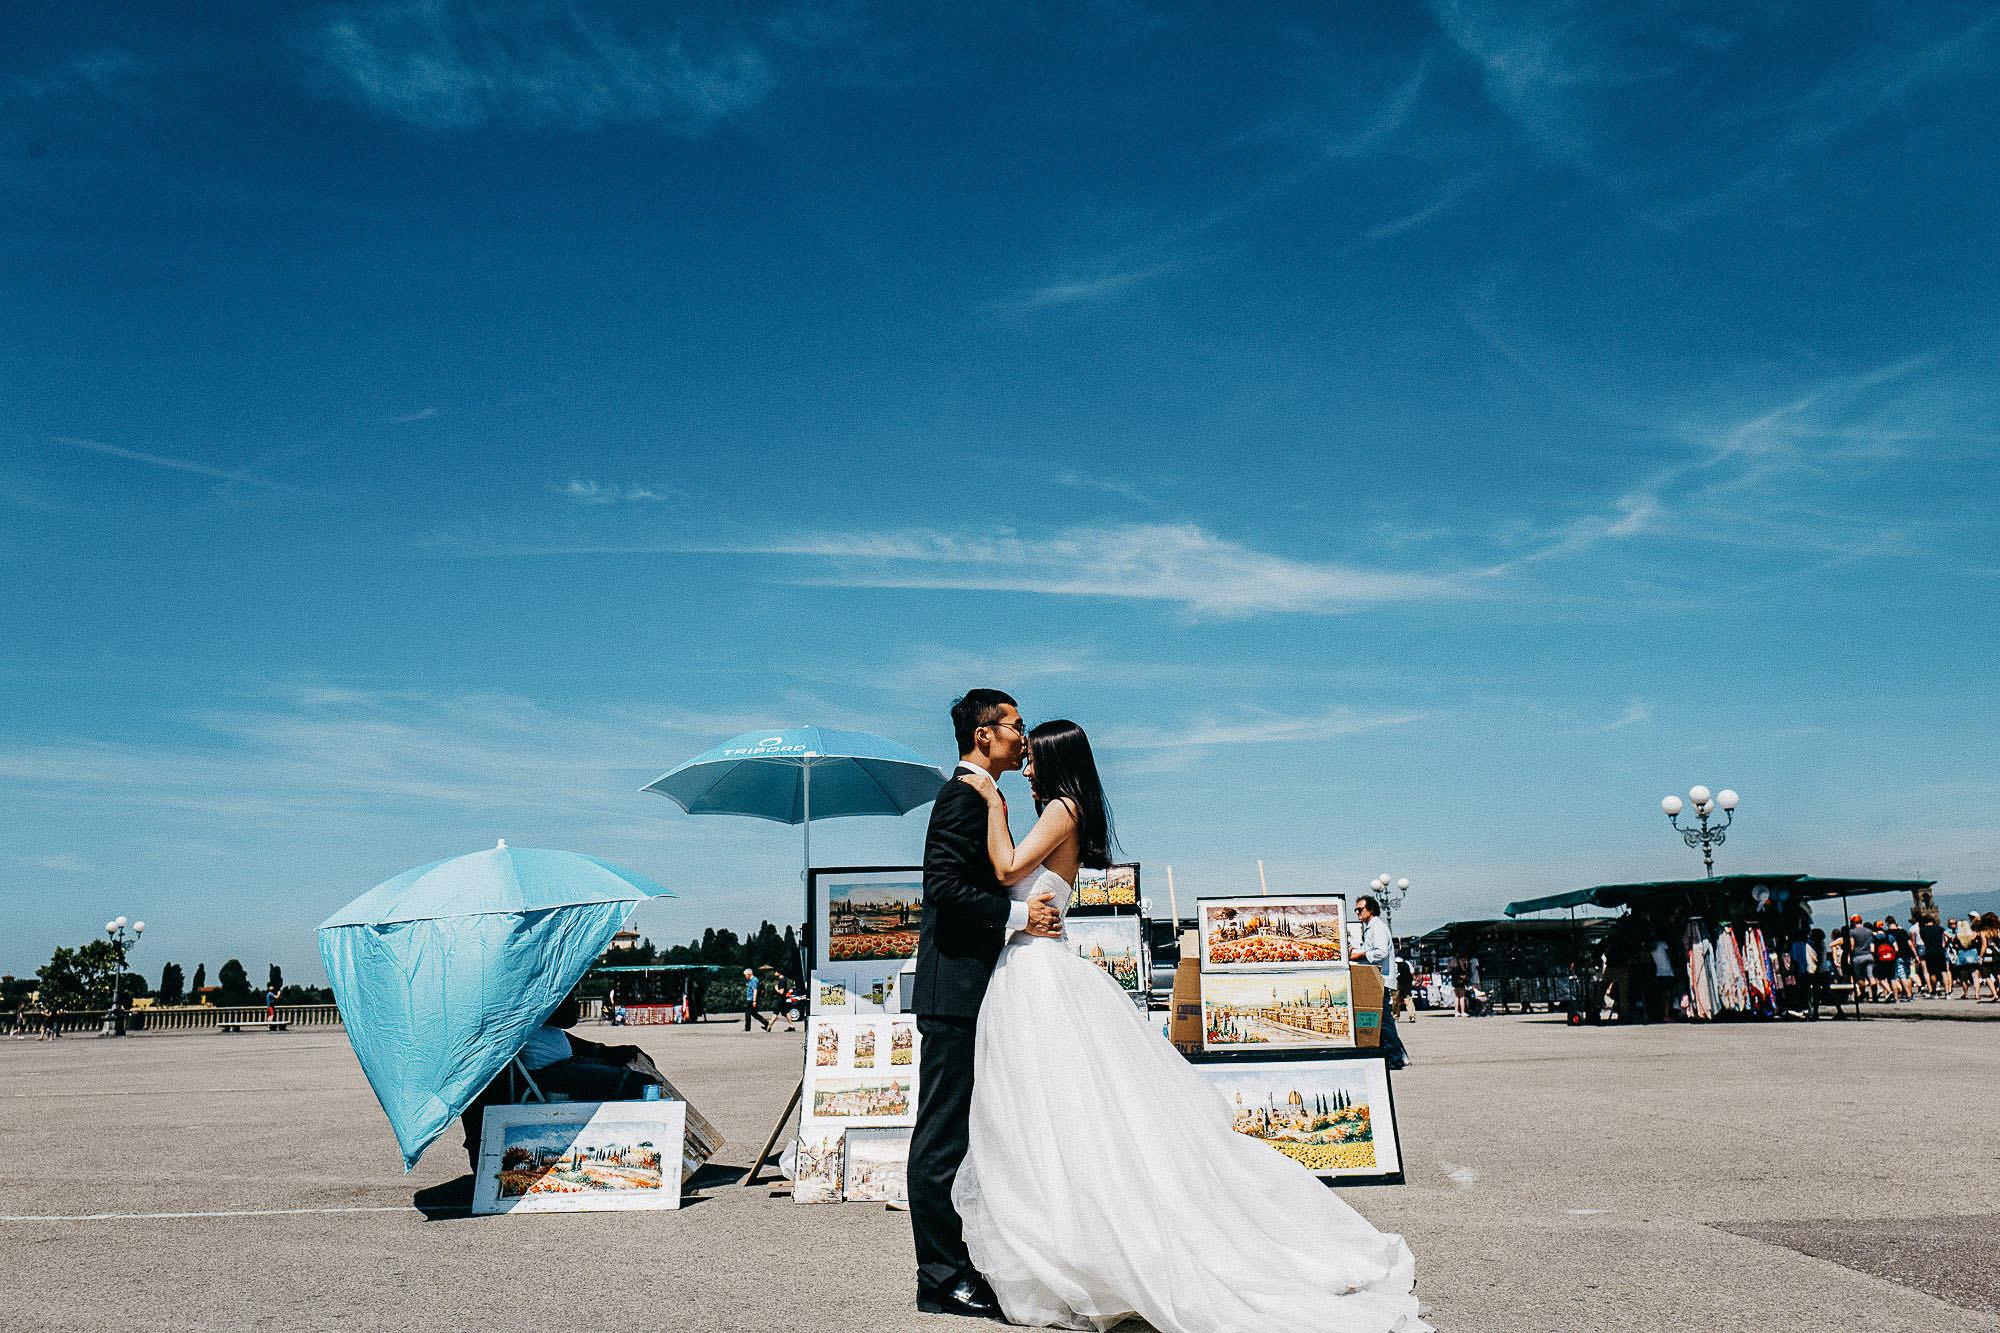 couple love bride groom photoshoot michelangiolo photo photography florence